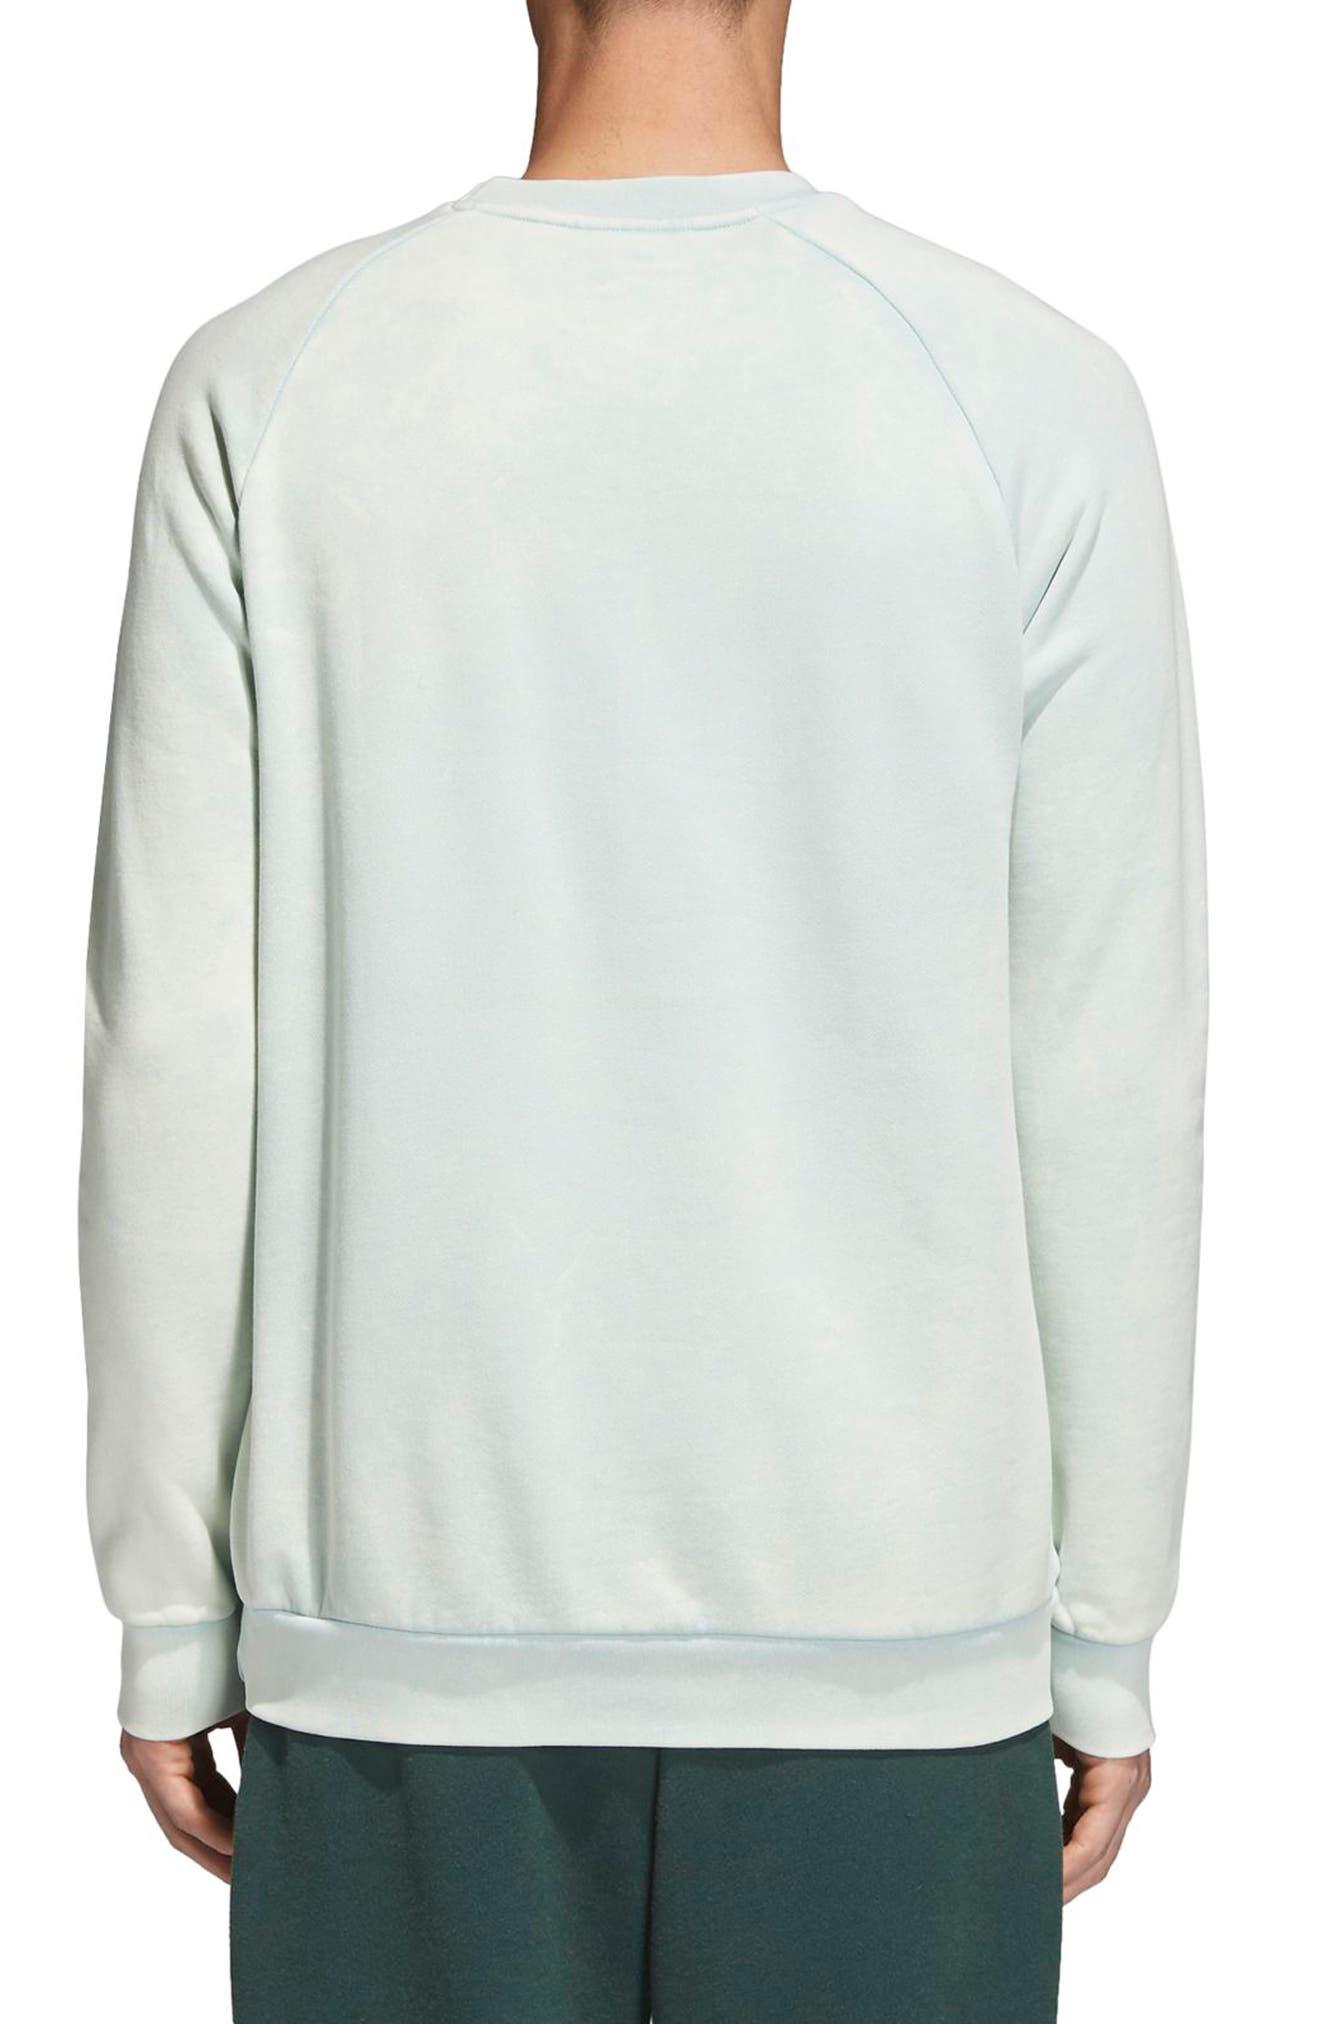 Trefoil Crewneck Sweatshirt,                             Alternate thumbnail 2, color,                             Ash Green